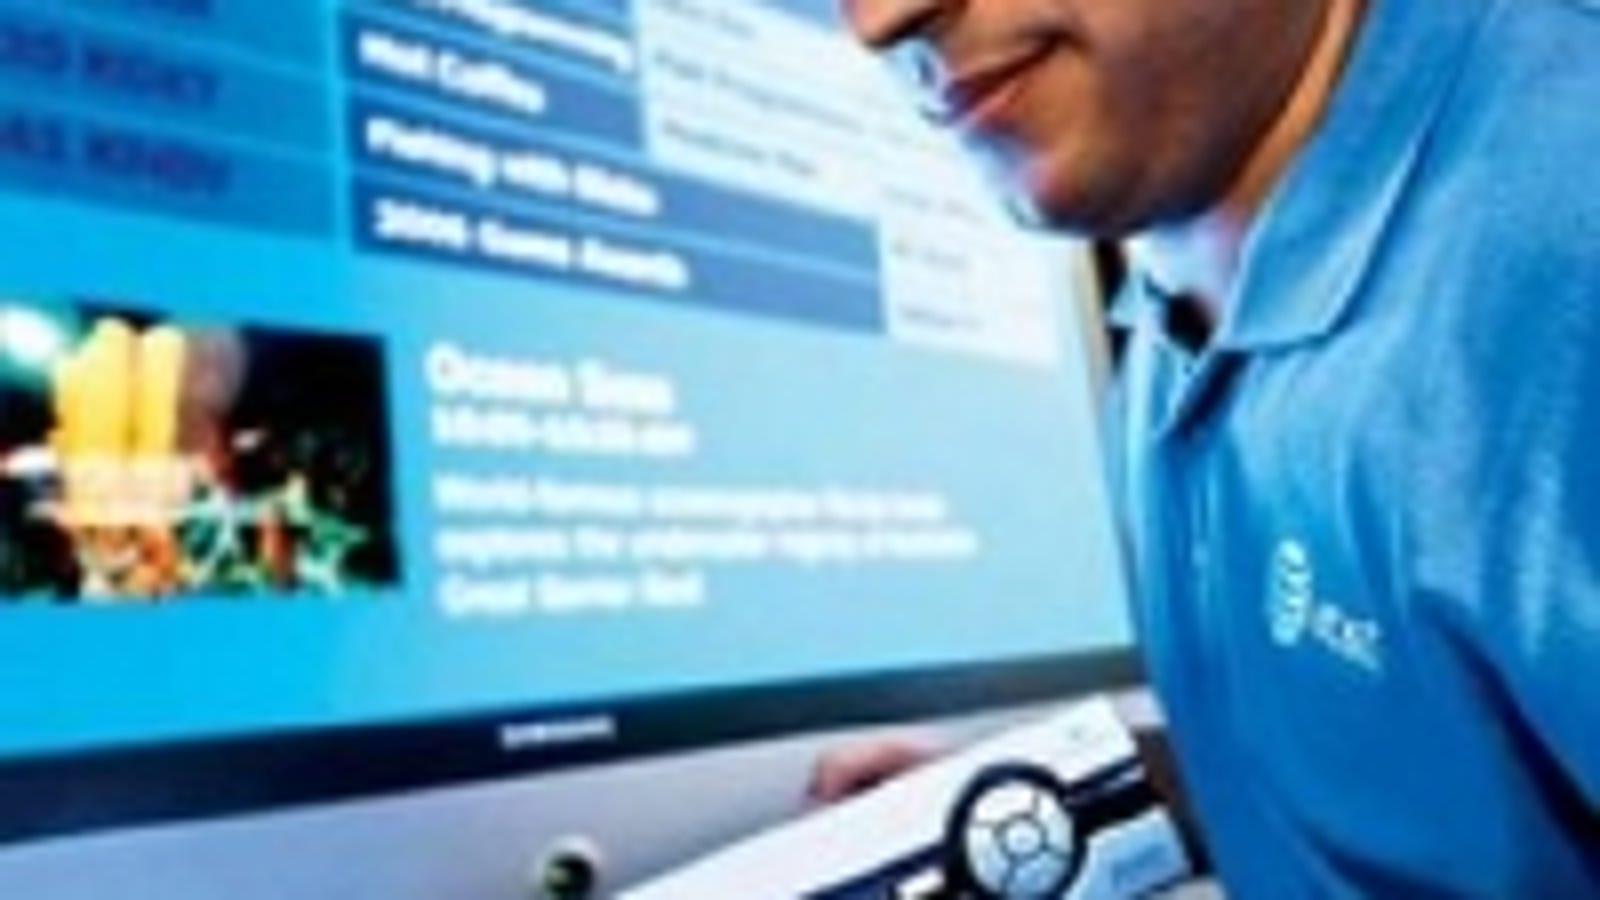 AT&T U-Verse Internet Review - April 2019 | MoneySavingPro